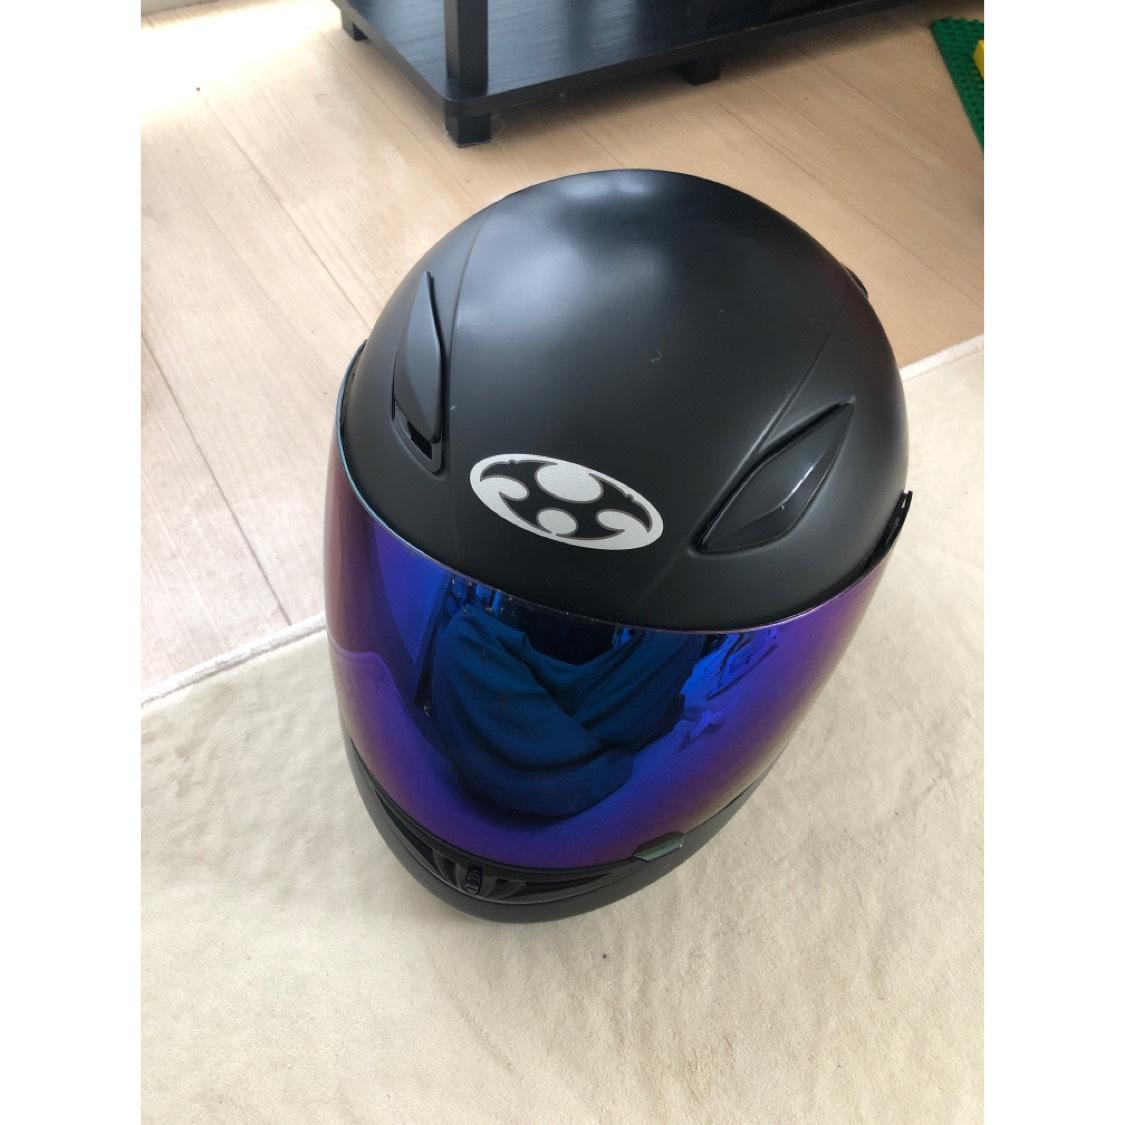 OGK KABUTO バイクヘルメット フルフェイス